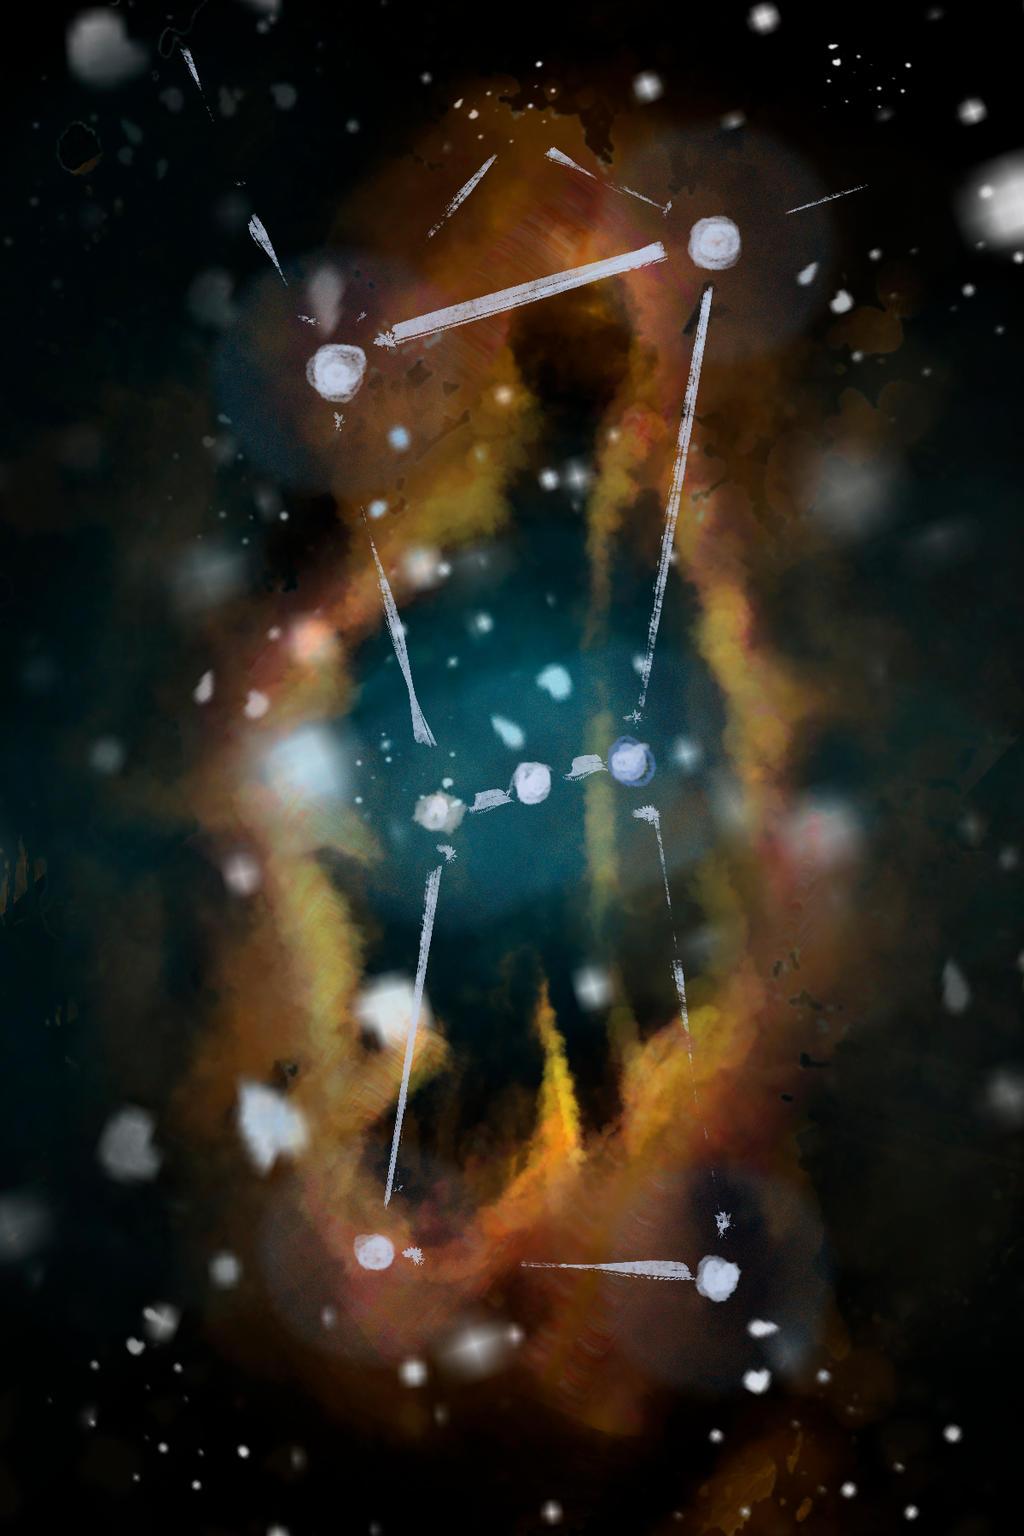 nasa orion constellation wallpaper - photo #47